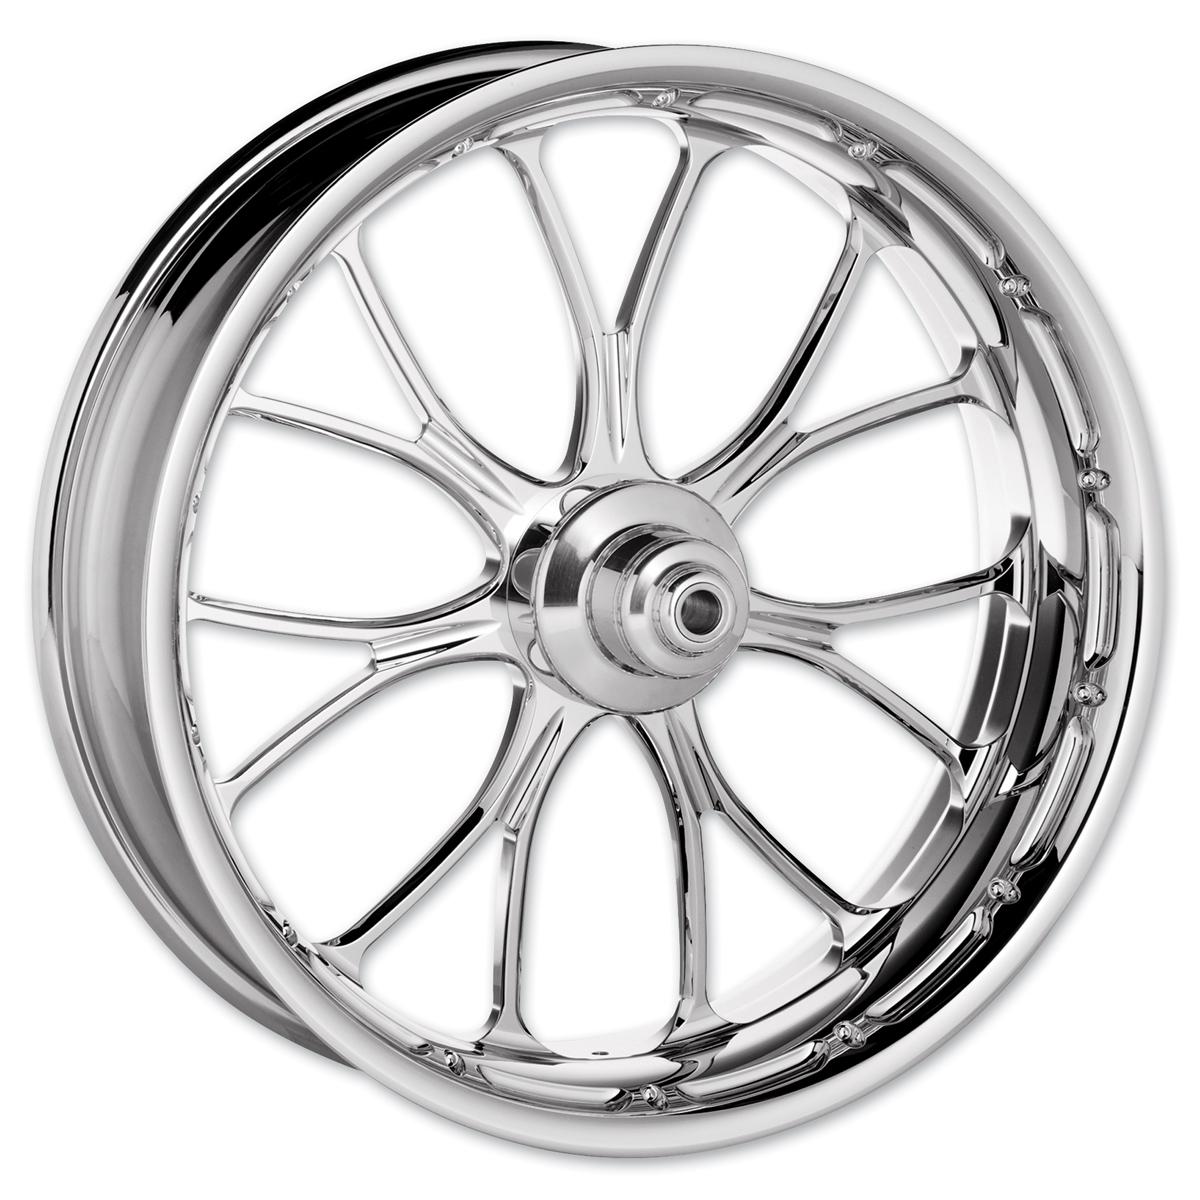 Performance Machine Heathen Chrome Rear Wheel 17x17.6 ABS